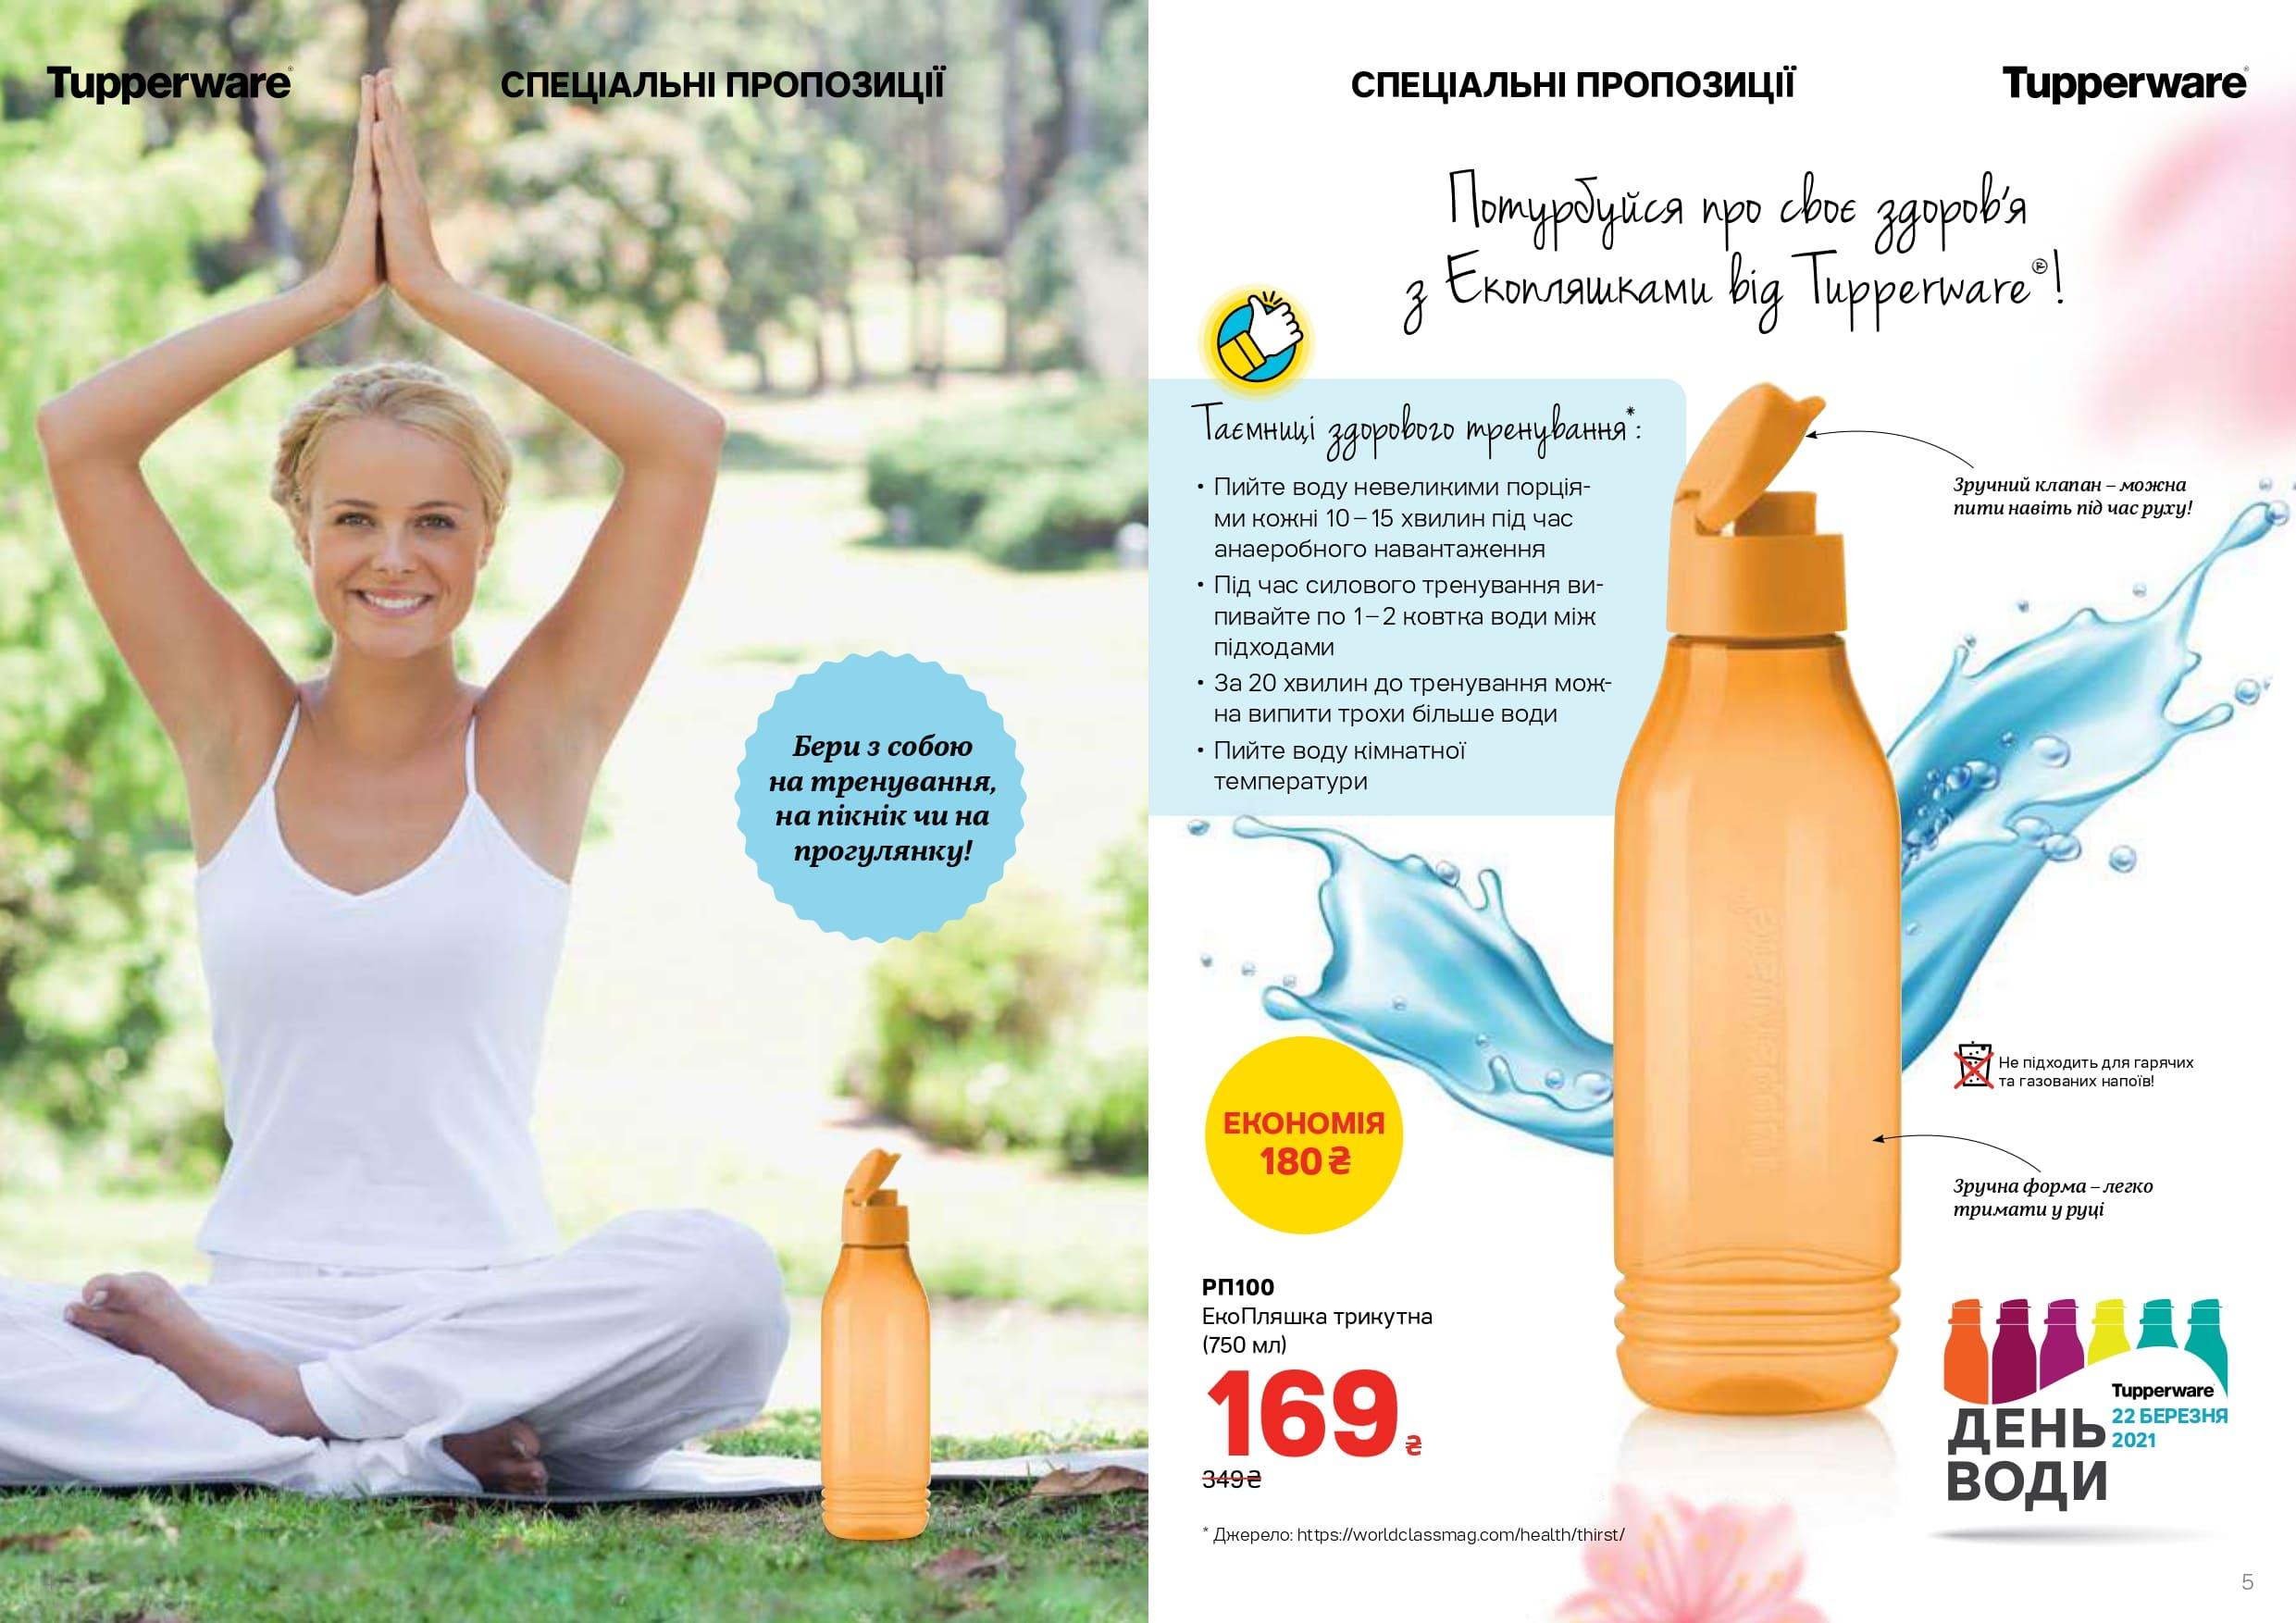 Эко бутылка треугольная 750 мл, скидка 52%.